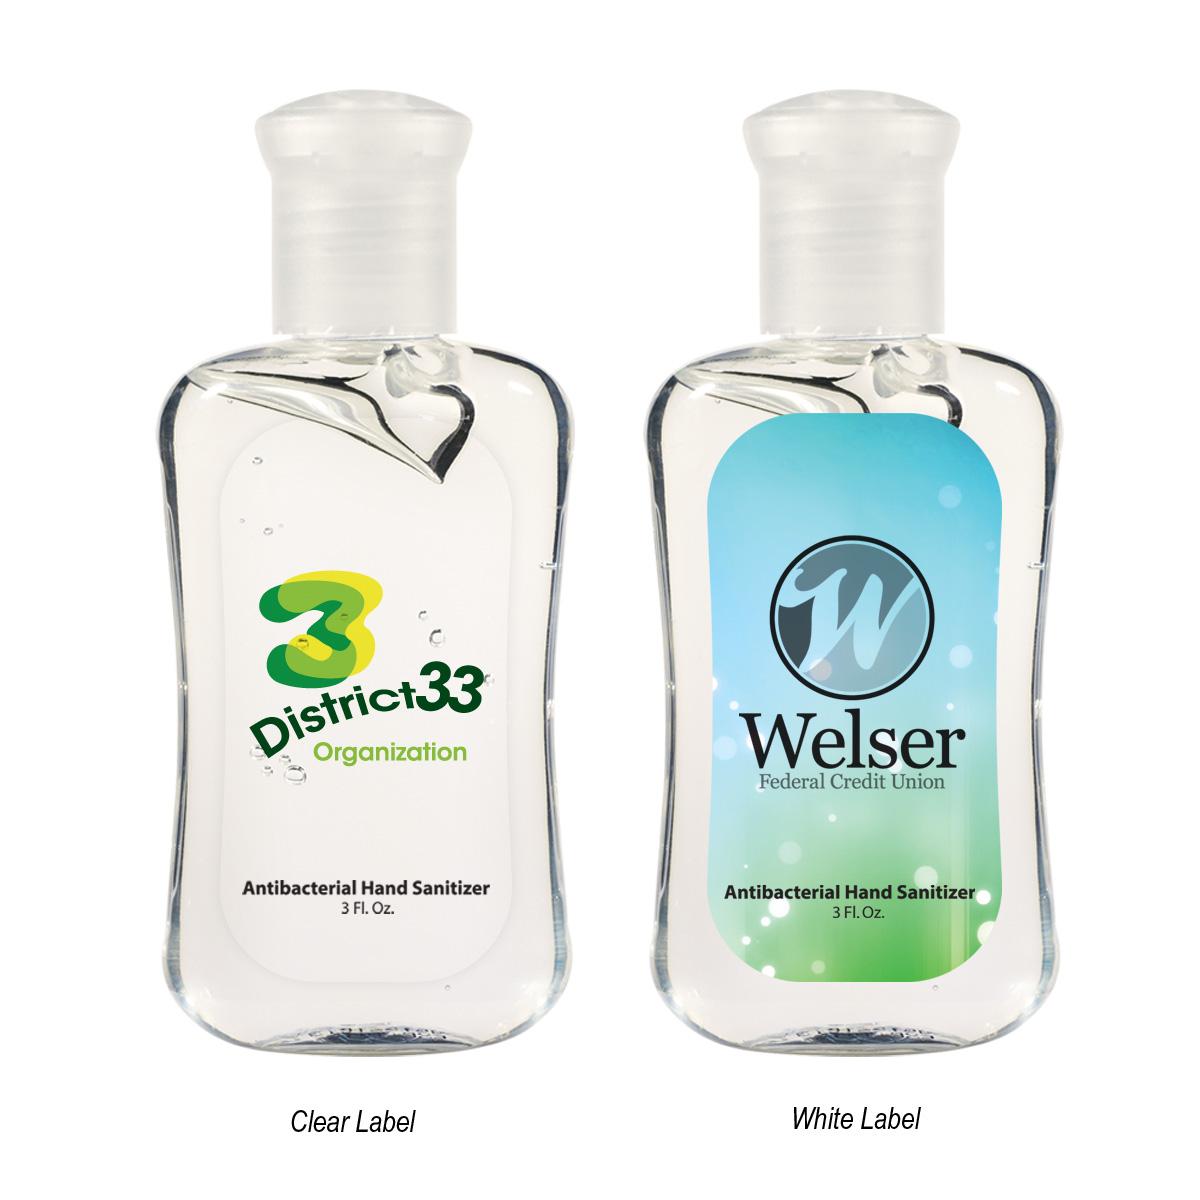 964289539-816 - 3 Oz. Hand Sanitizer Fashion Bottle - thumbnail